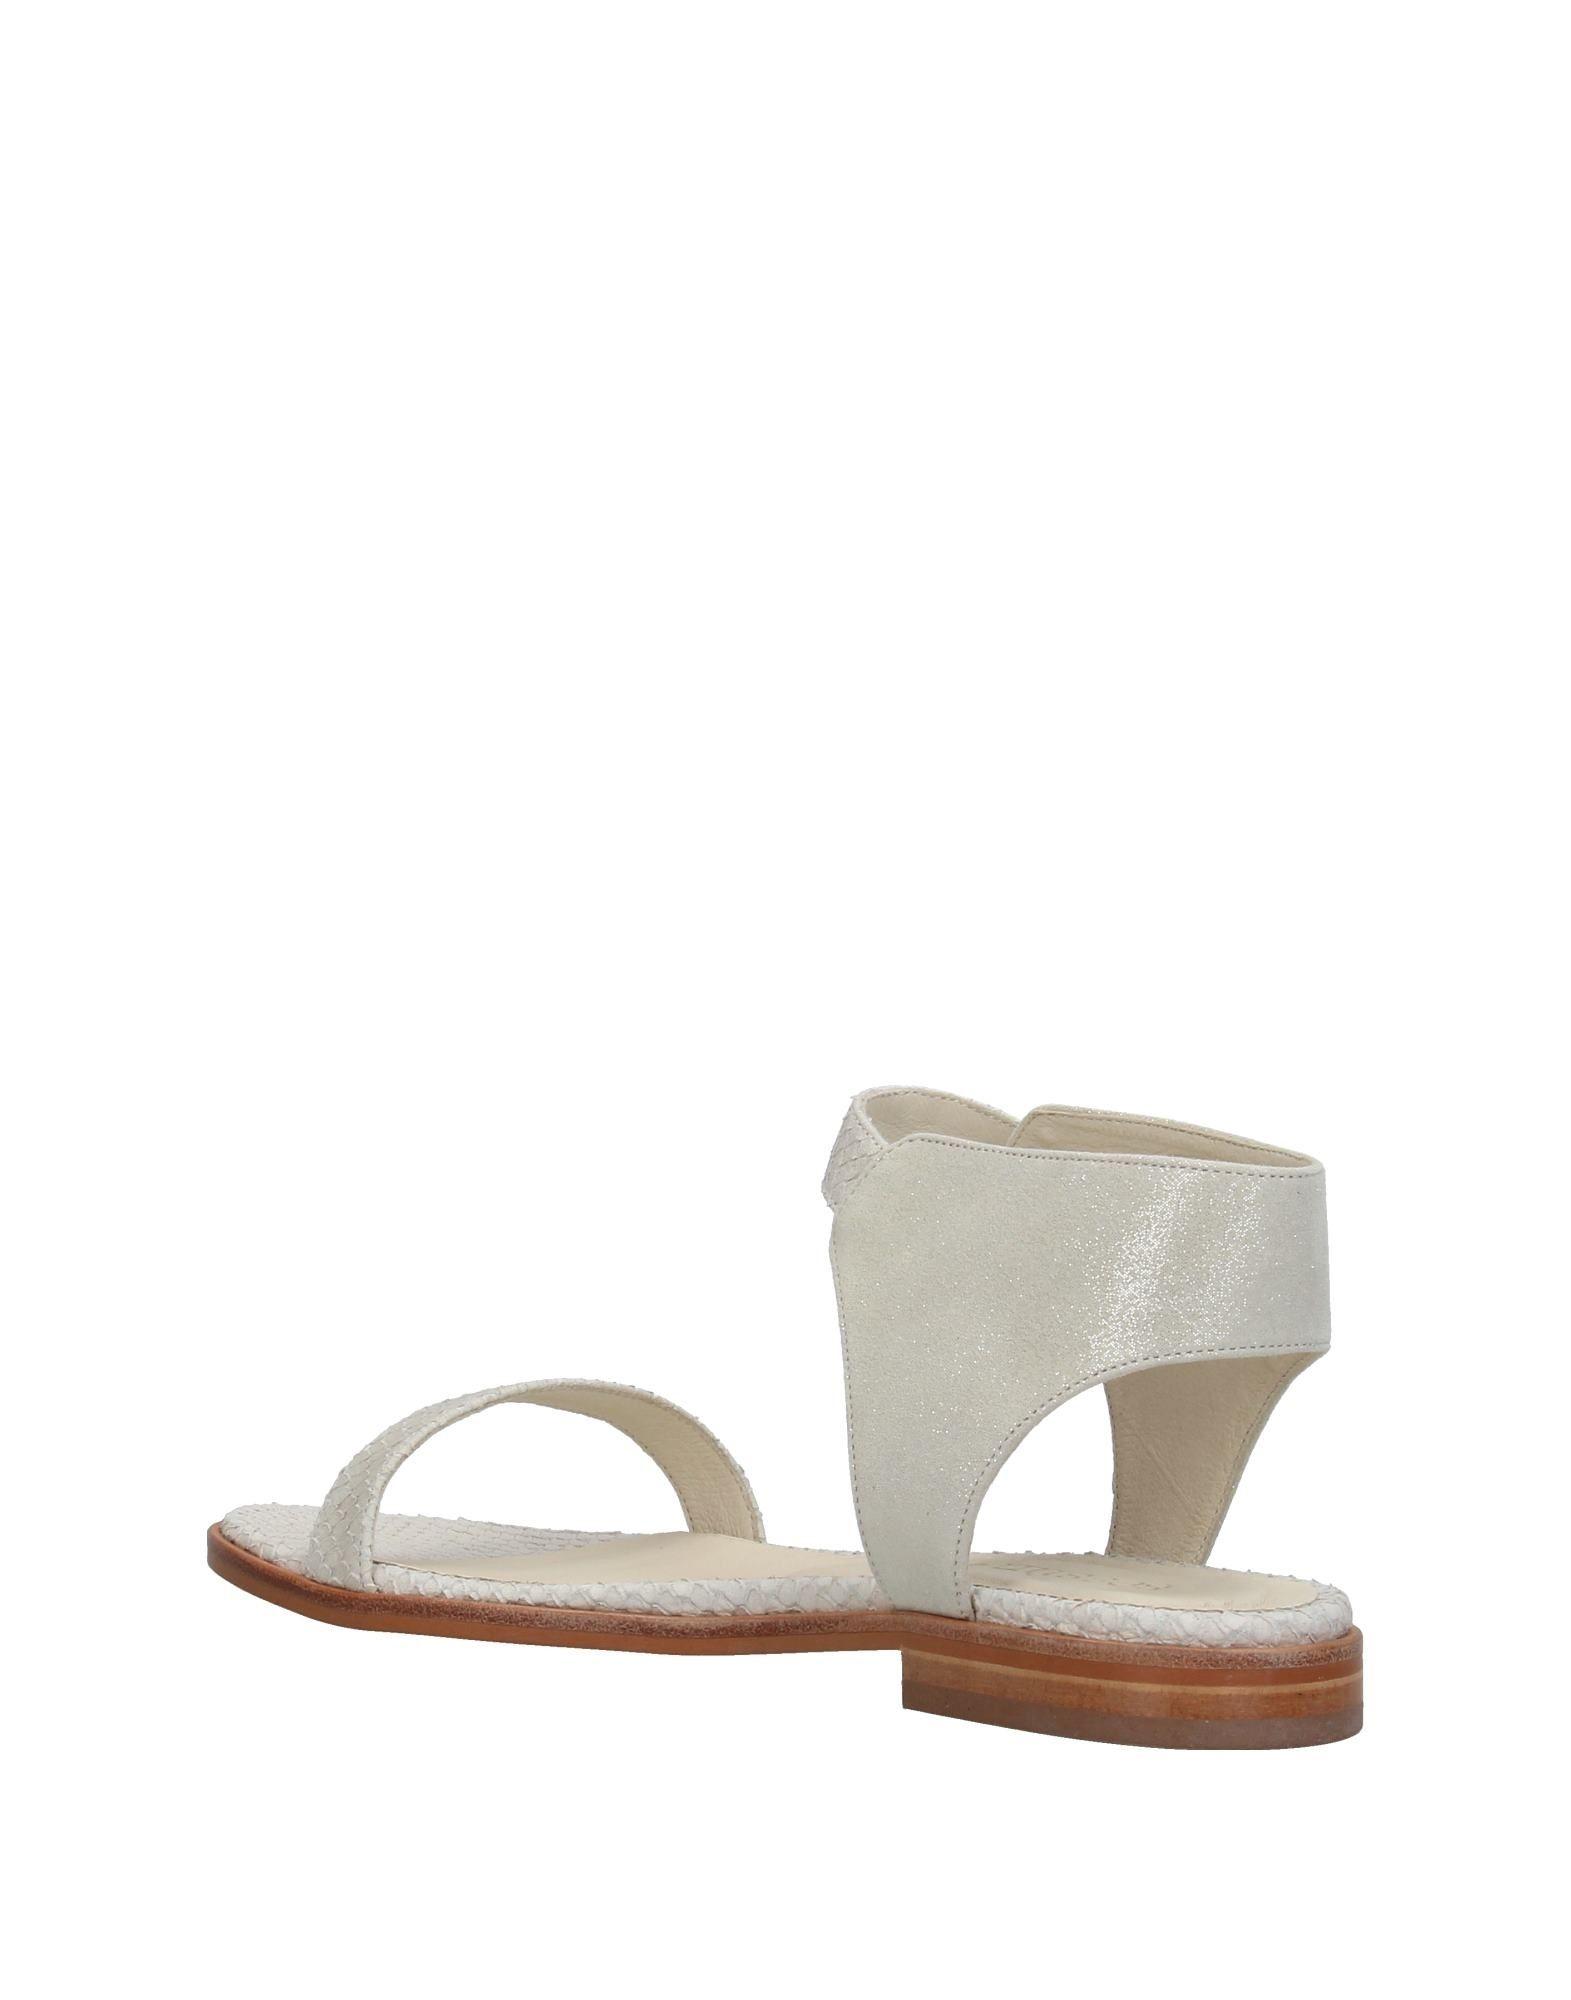 Sandales Sessun Femme - Sandales Sessun sur